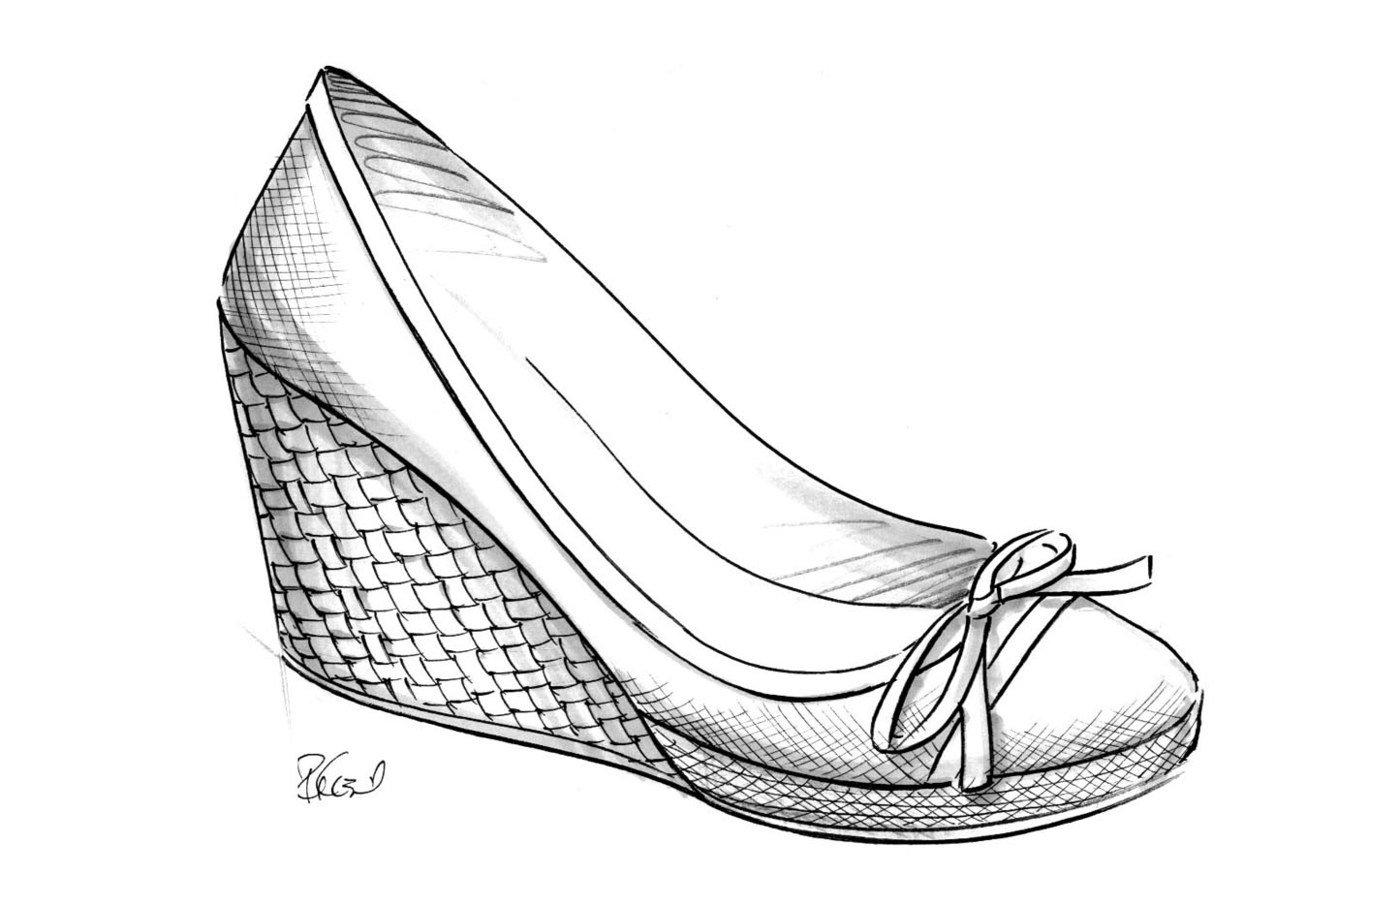 Comfort Casual Footwear By Robert Klein At Coroflot Com